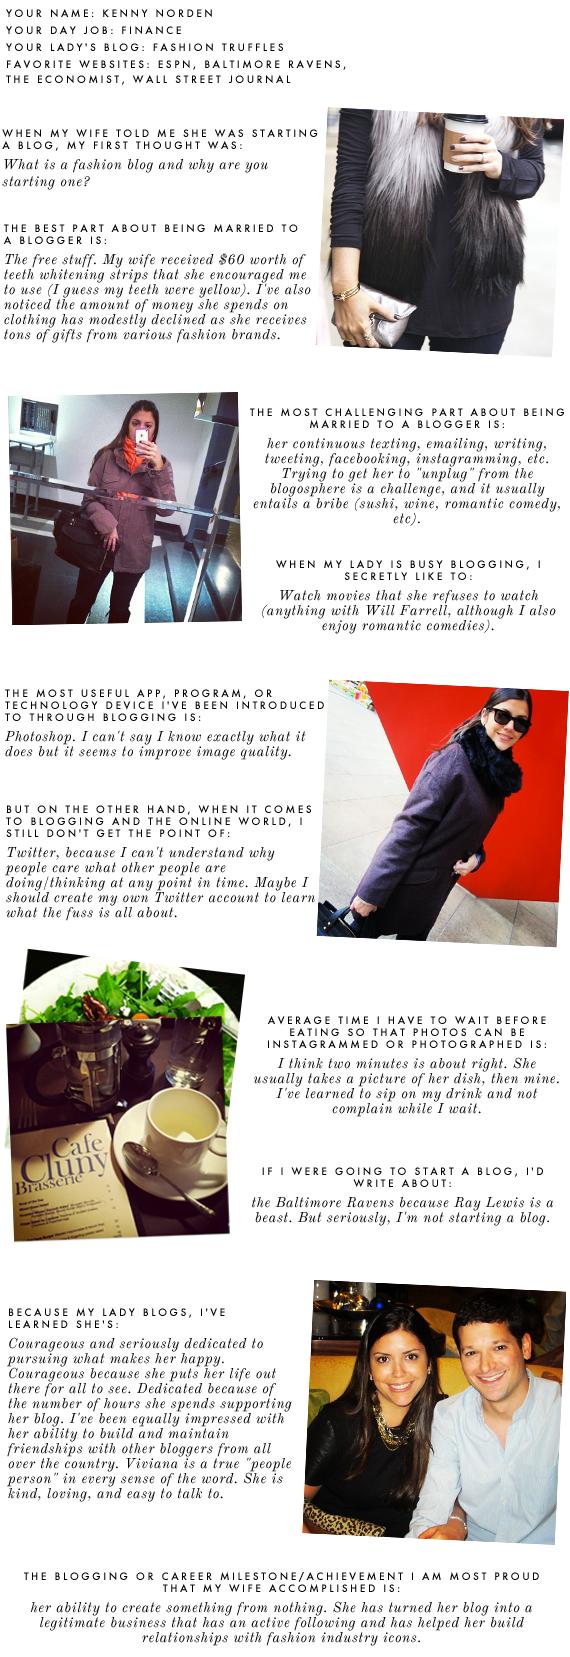 man behind the blog - fashion truffles | via vmac+cheese